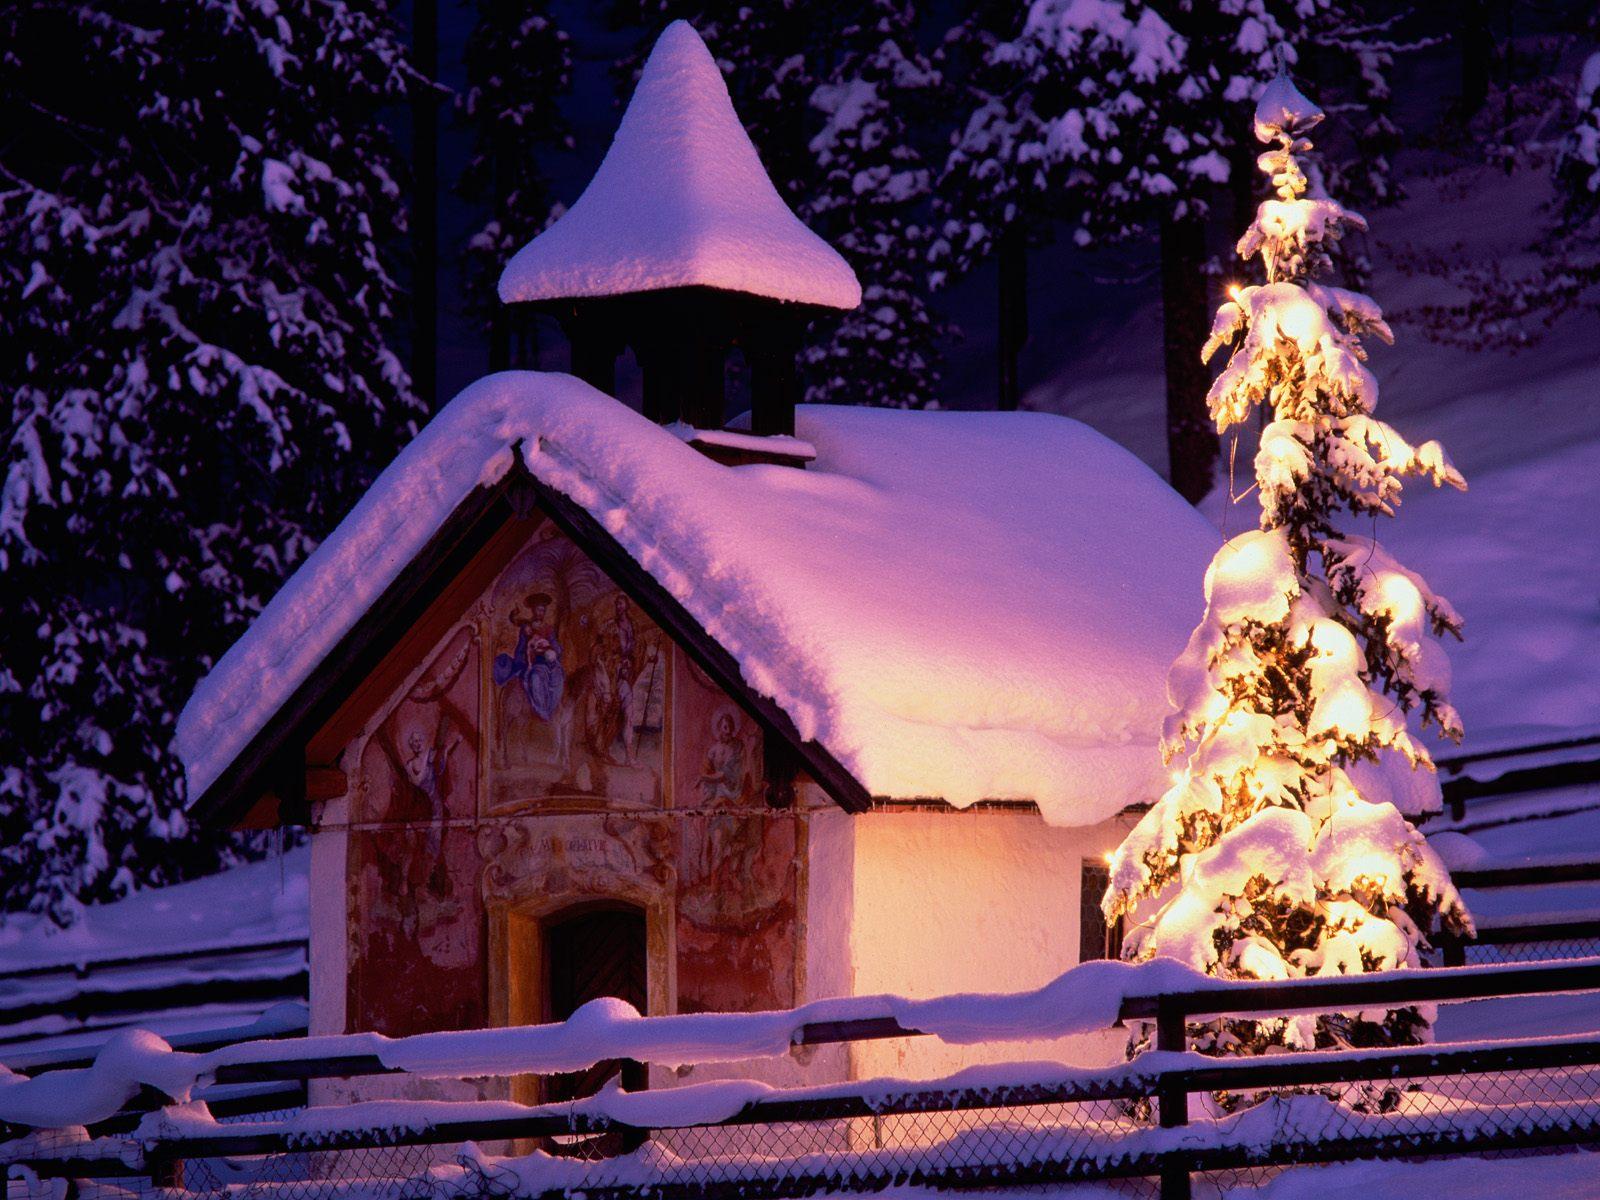 merry christmas desktop background wallpapers - Christmas Desktop Background